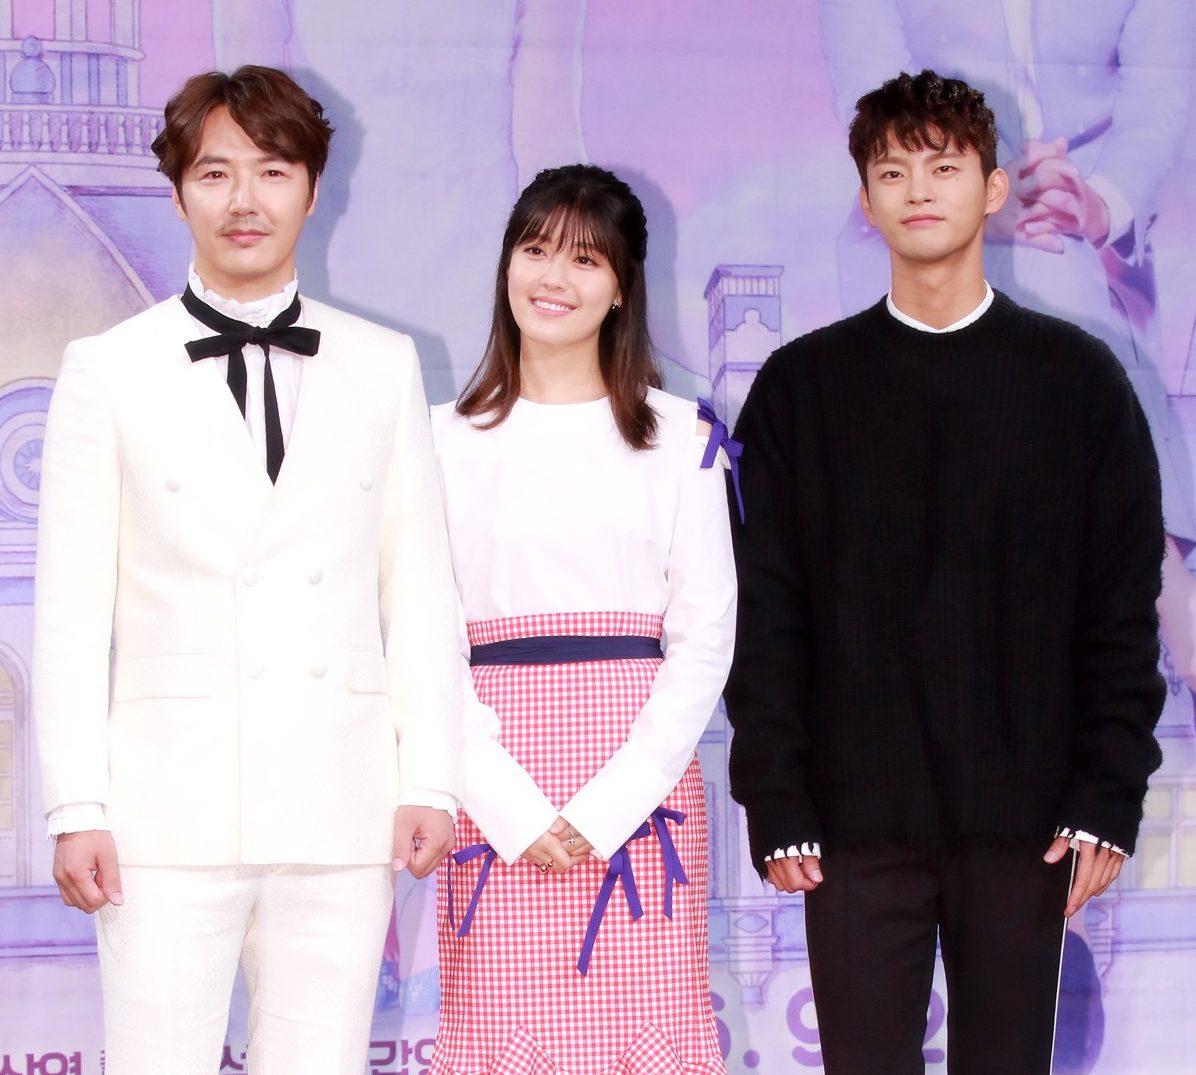 """Shopping King Louie"" menciona la diferencia de edad entre Nam Ji Hyun, Seo In Guk y Yoon Sang Hyun"